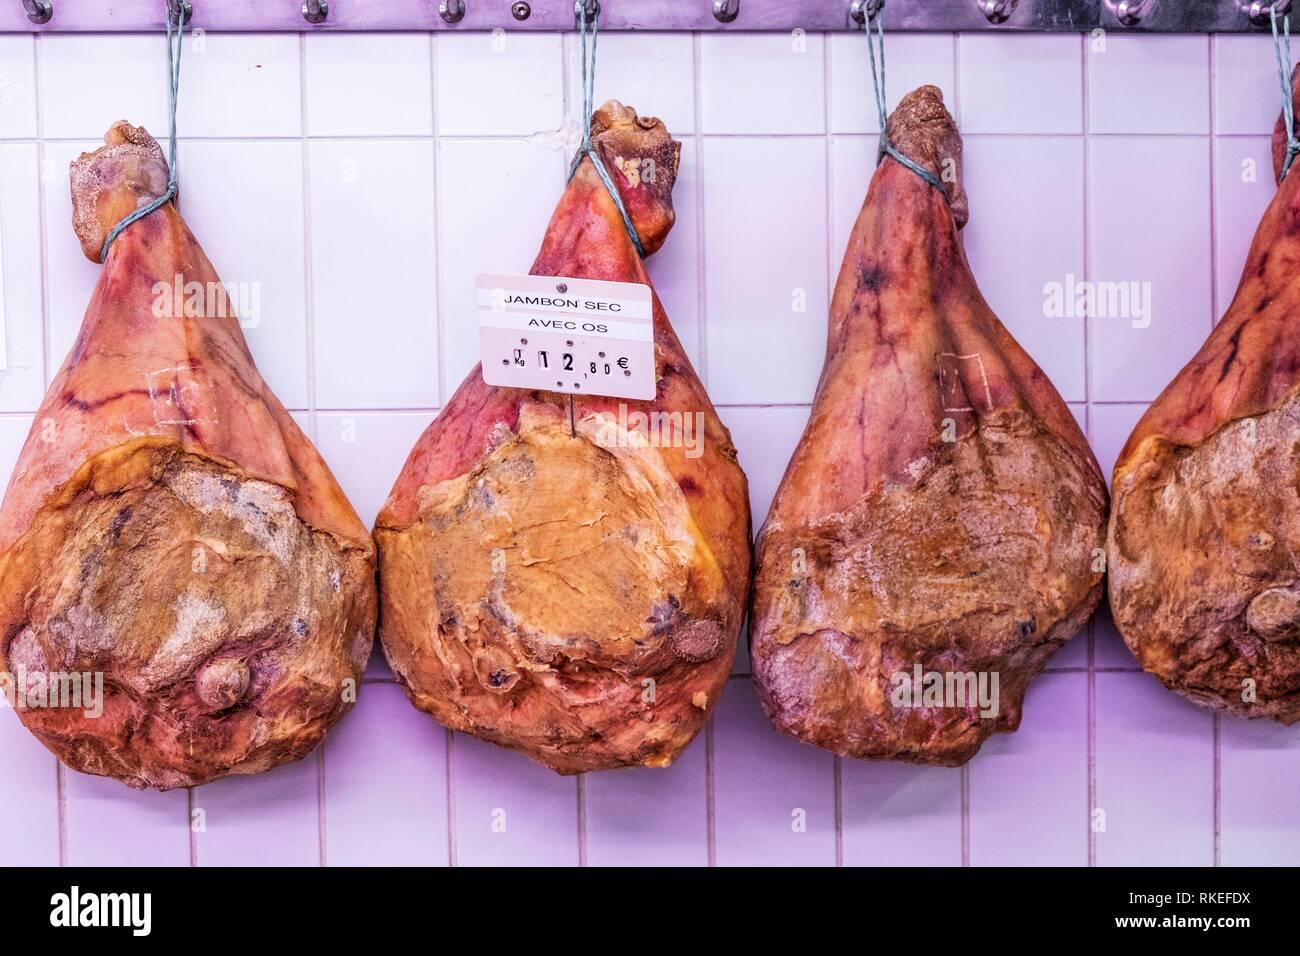 France. Food. ''Jambon sec '' (dry ham). - Stock Image